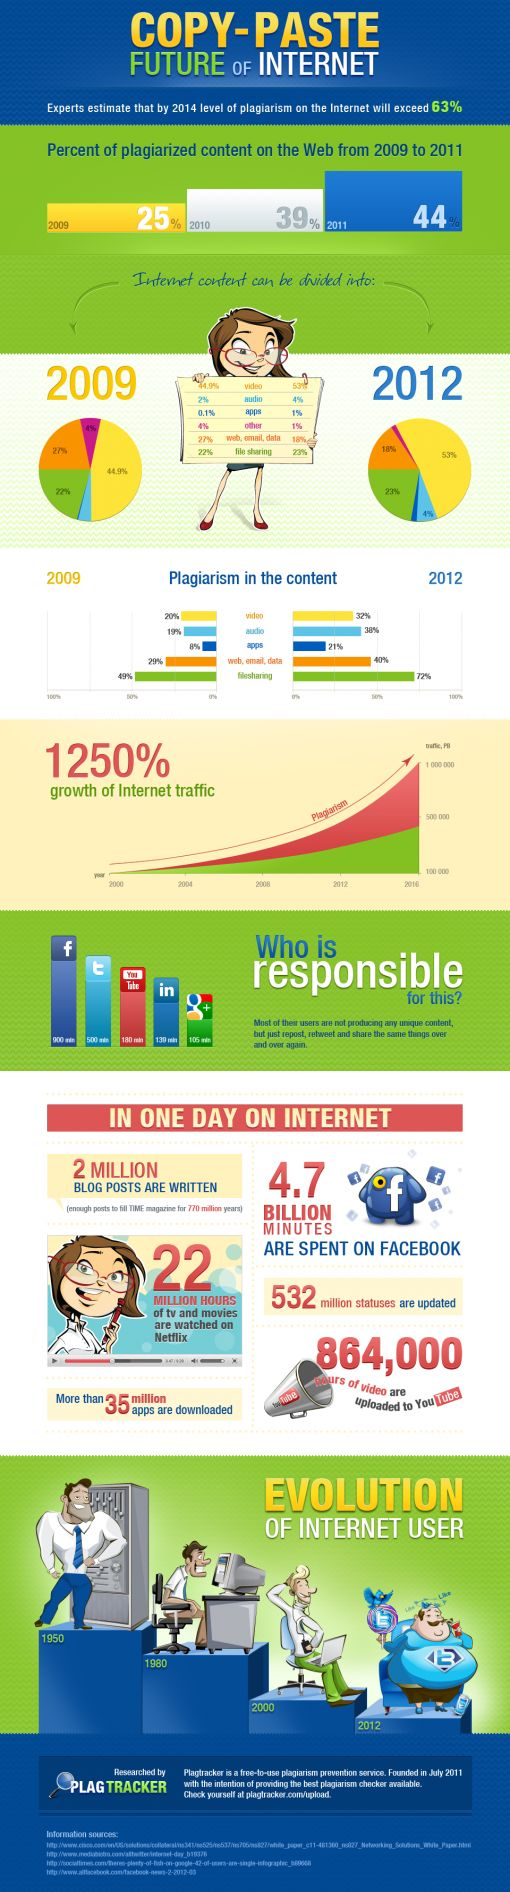 copy-paste-future-internet